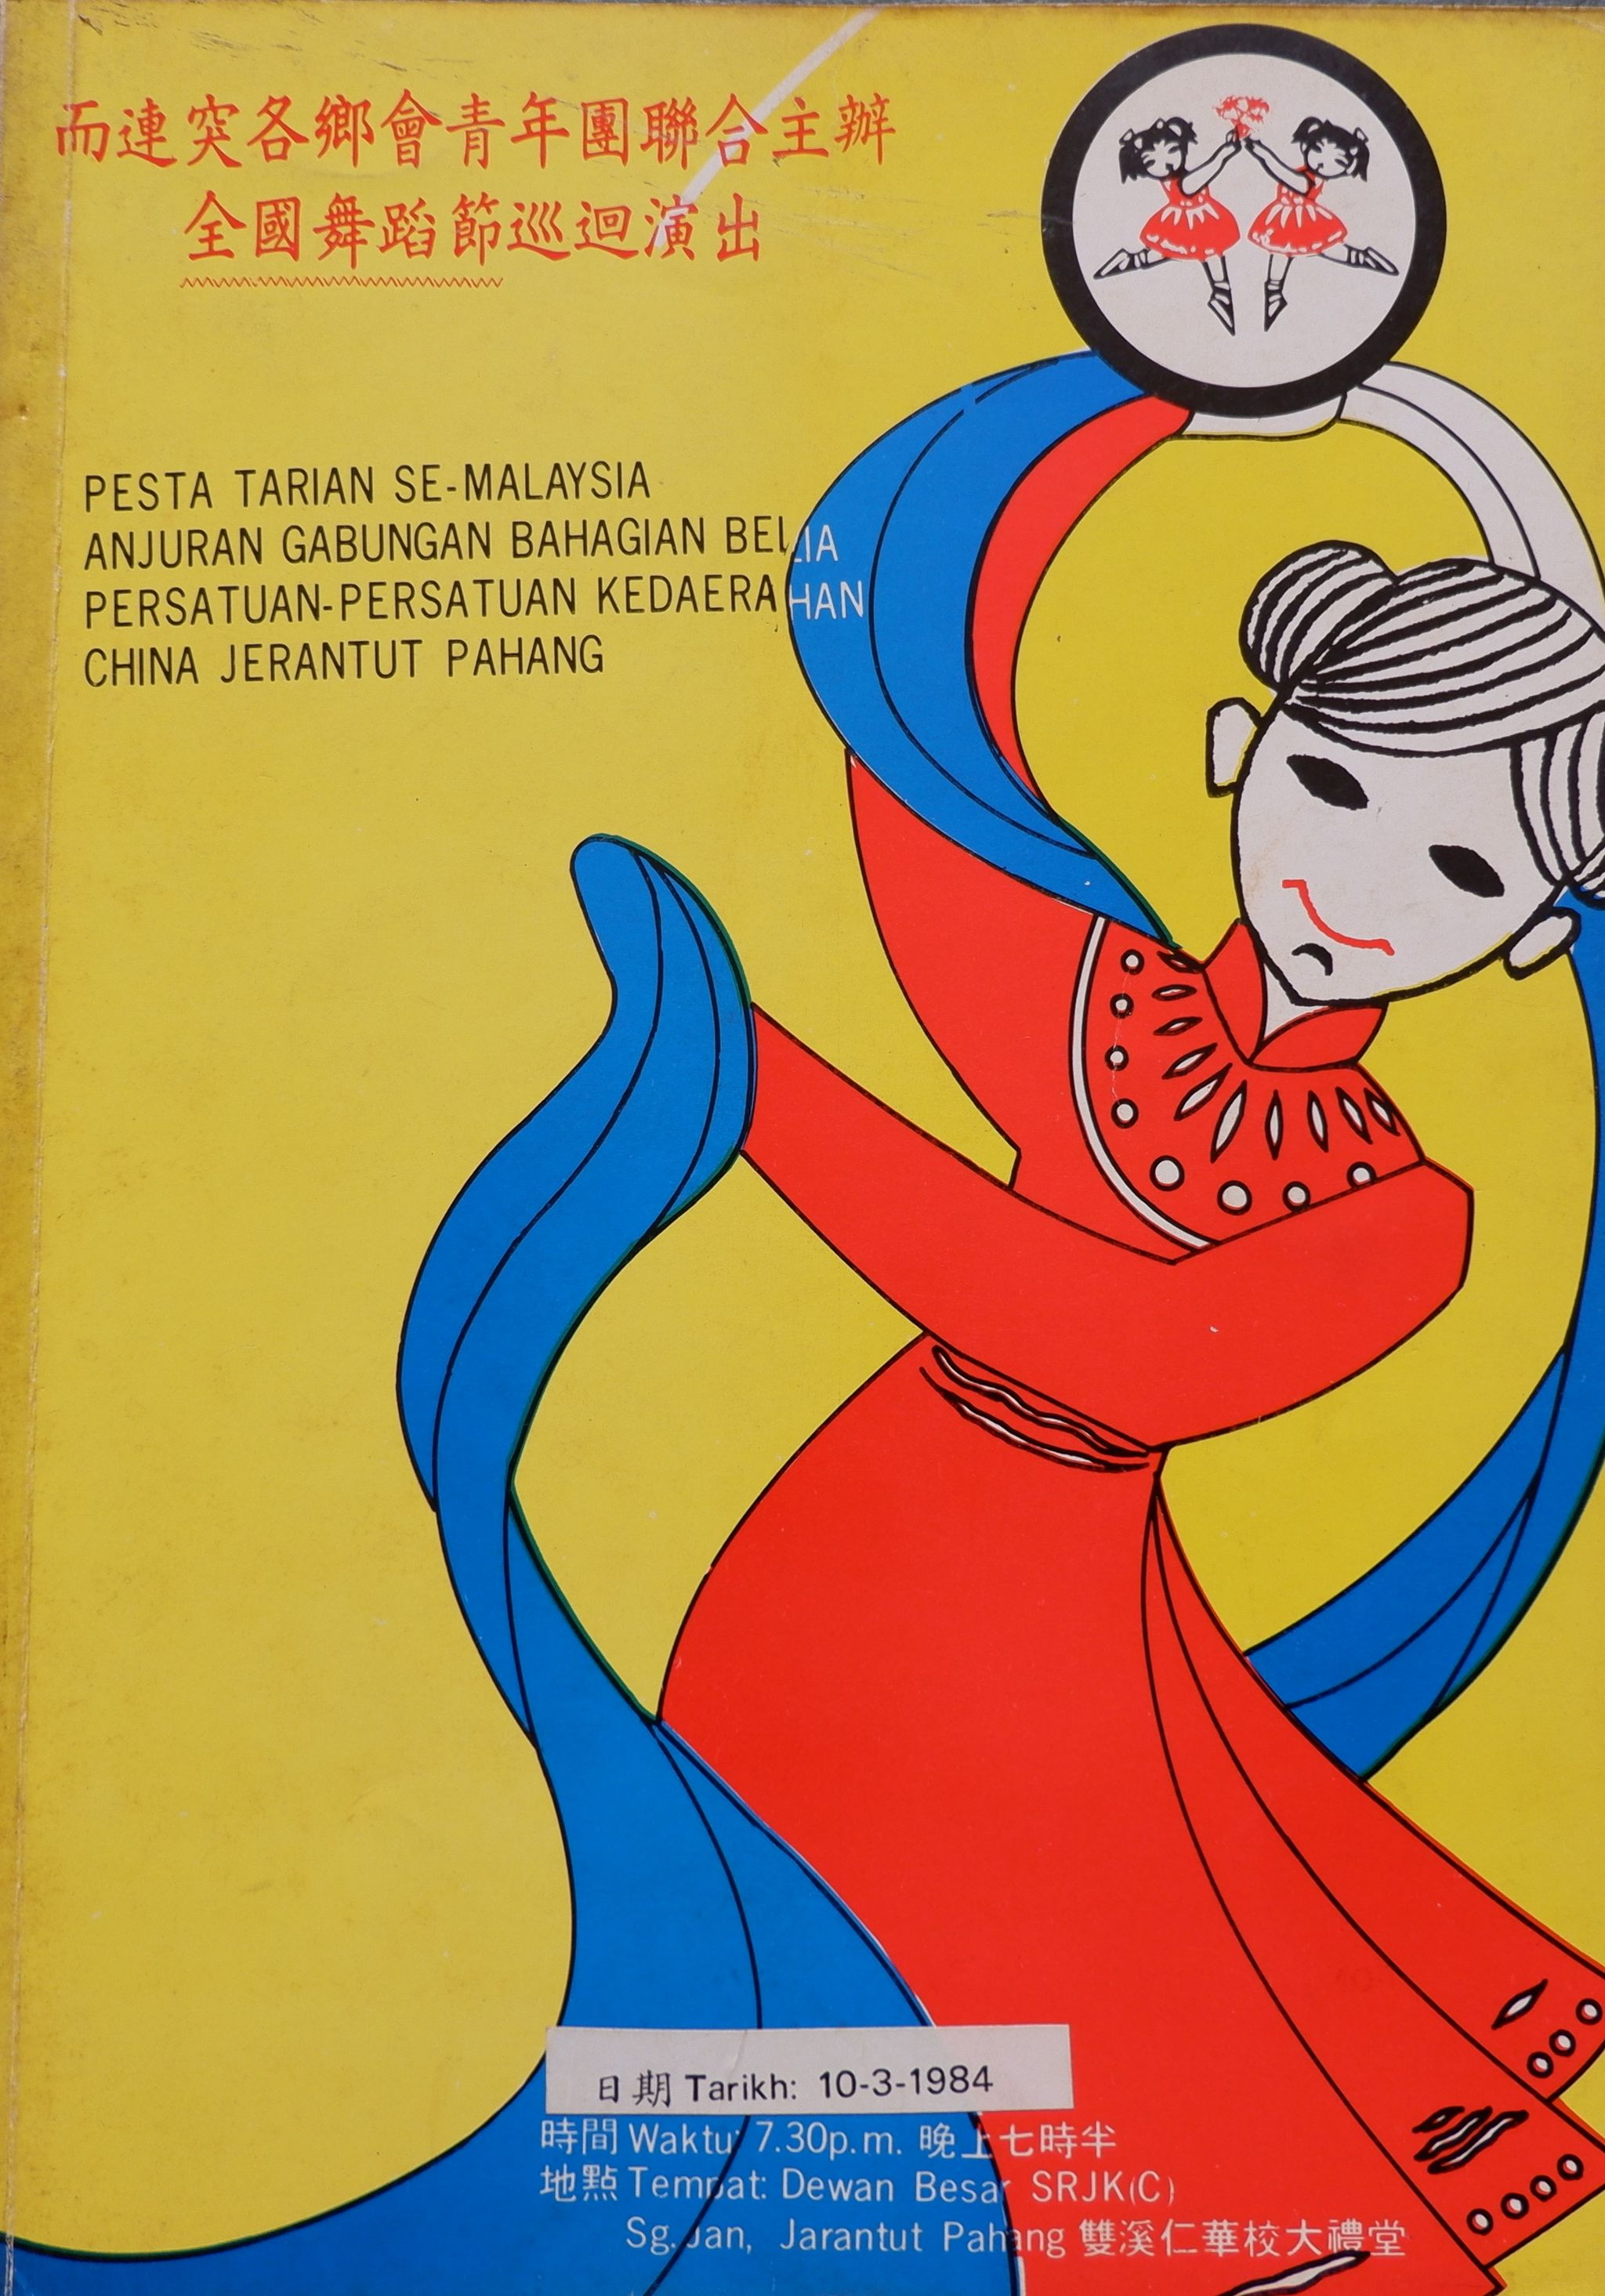 1984 Pesta Tarian Se Malaysia Jerantut Pahang Cover